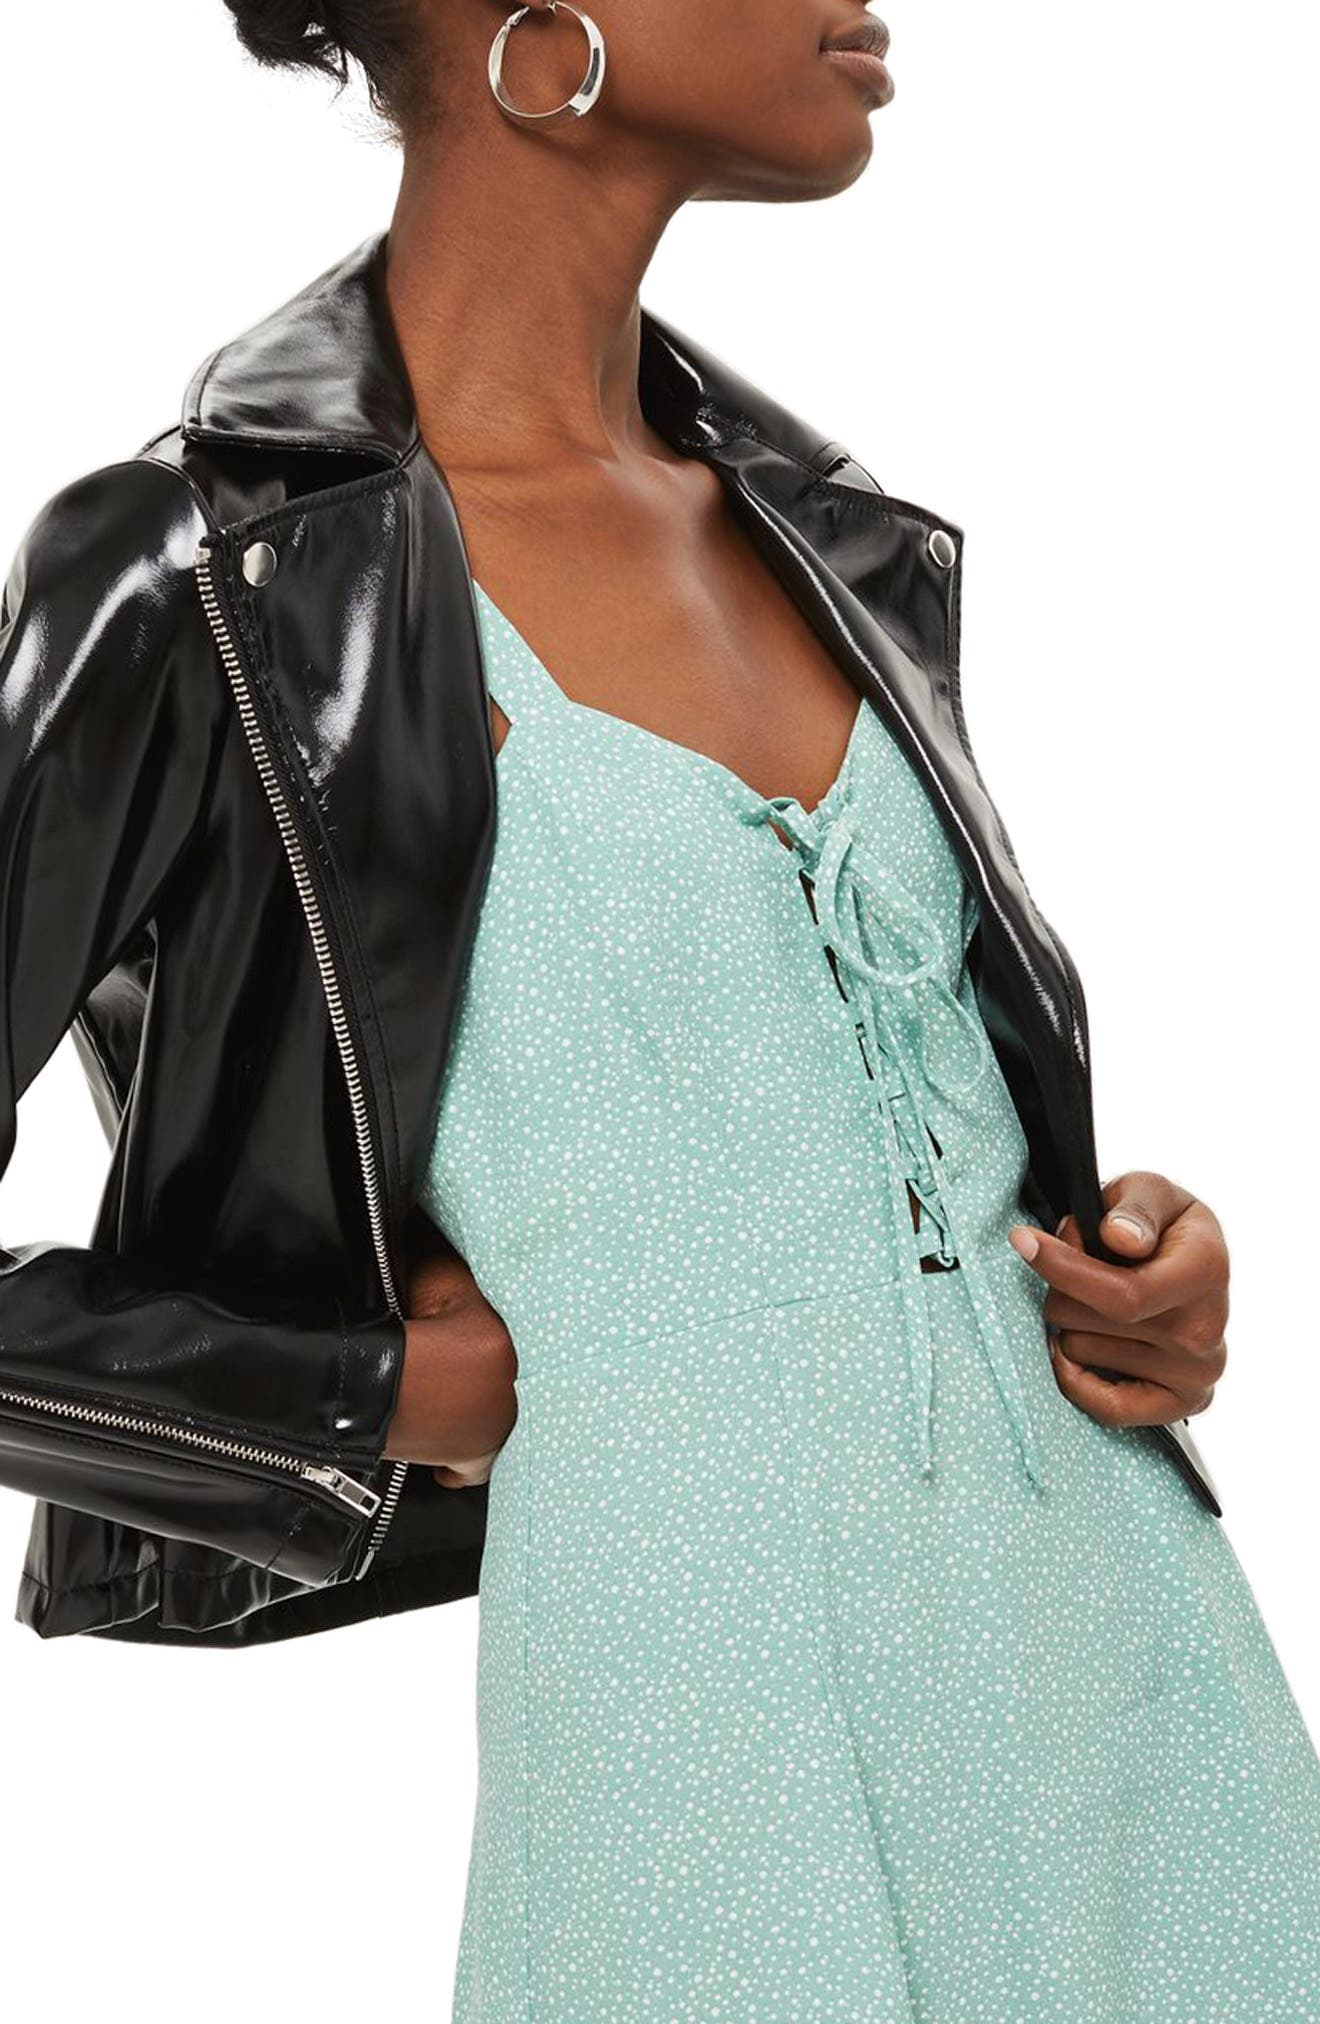 Alternate Image 1 Selected - Topshop Polka Dot Lace-Up Minidress